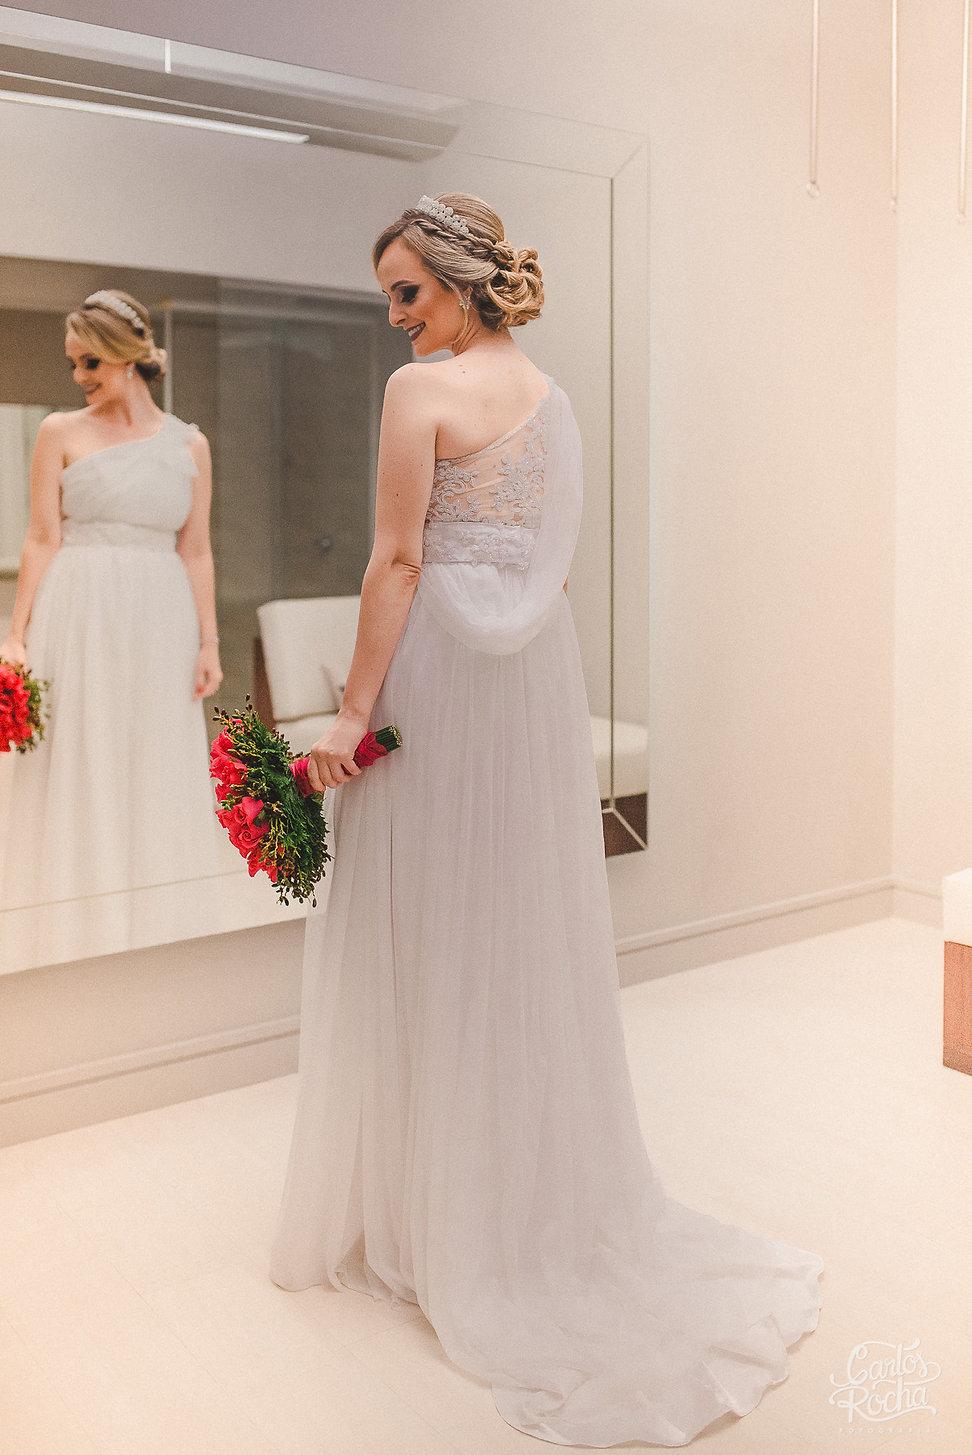 fotografia de casamento em presidente prudente, salão there presidente prudente, fotógrafo de casamento em presidente prudente, vestido de noiva, buque, pruden flora